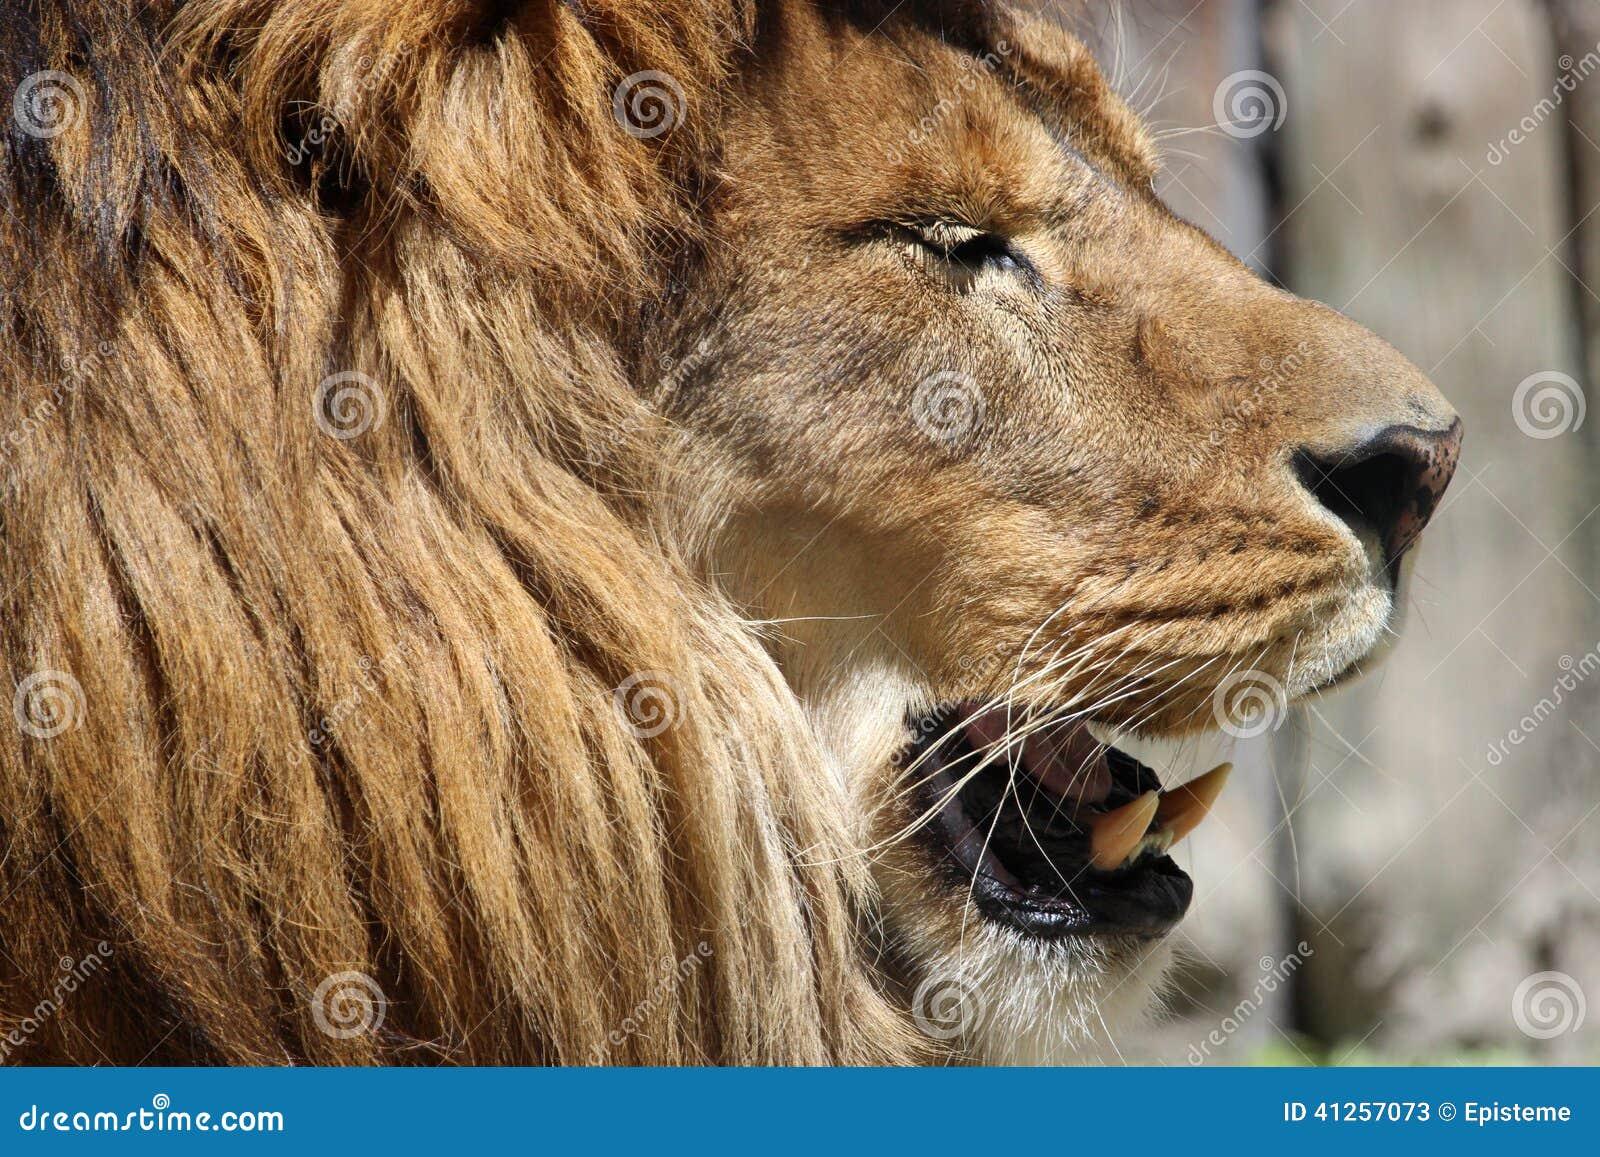 Lion Head Profile Stock Photo - Image: 41257073